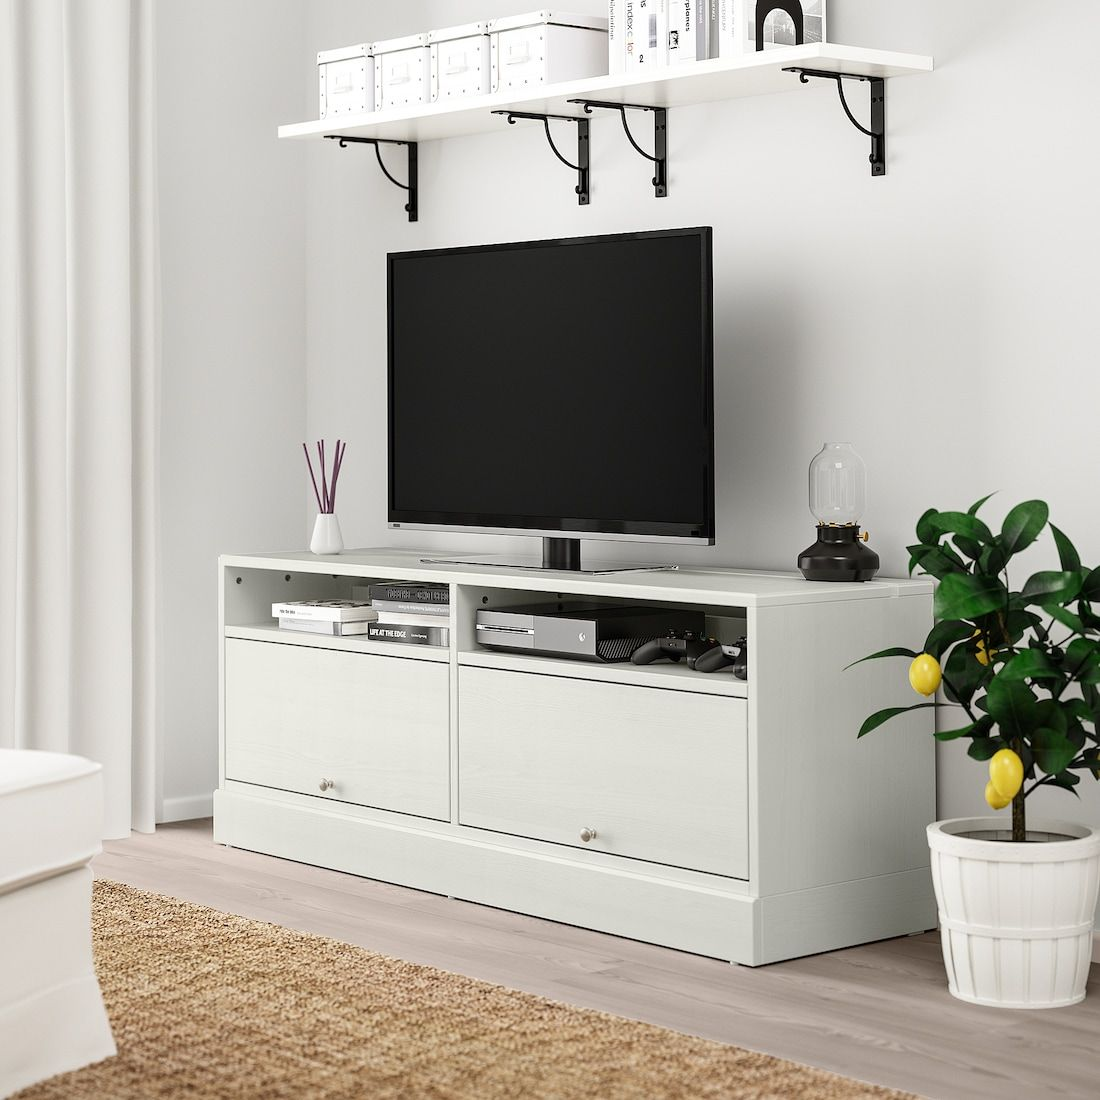 Havsta Tv Unit With Base White Ikea Tv Bench Tv Unit White Tv Unit [ 1100 x 1100 Pixel ]